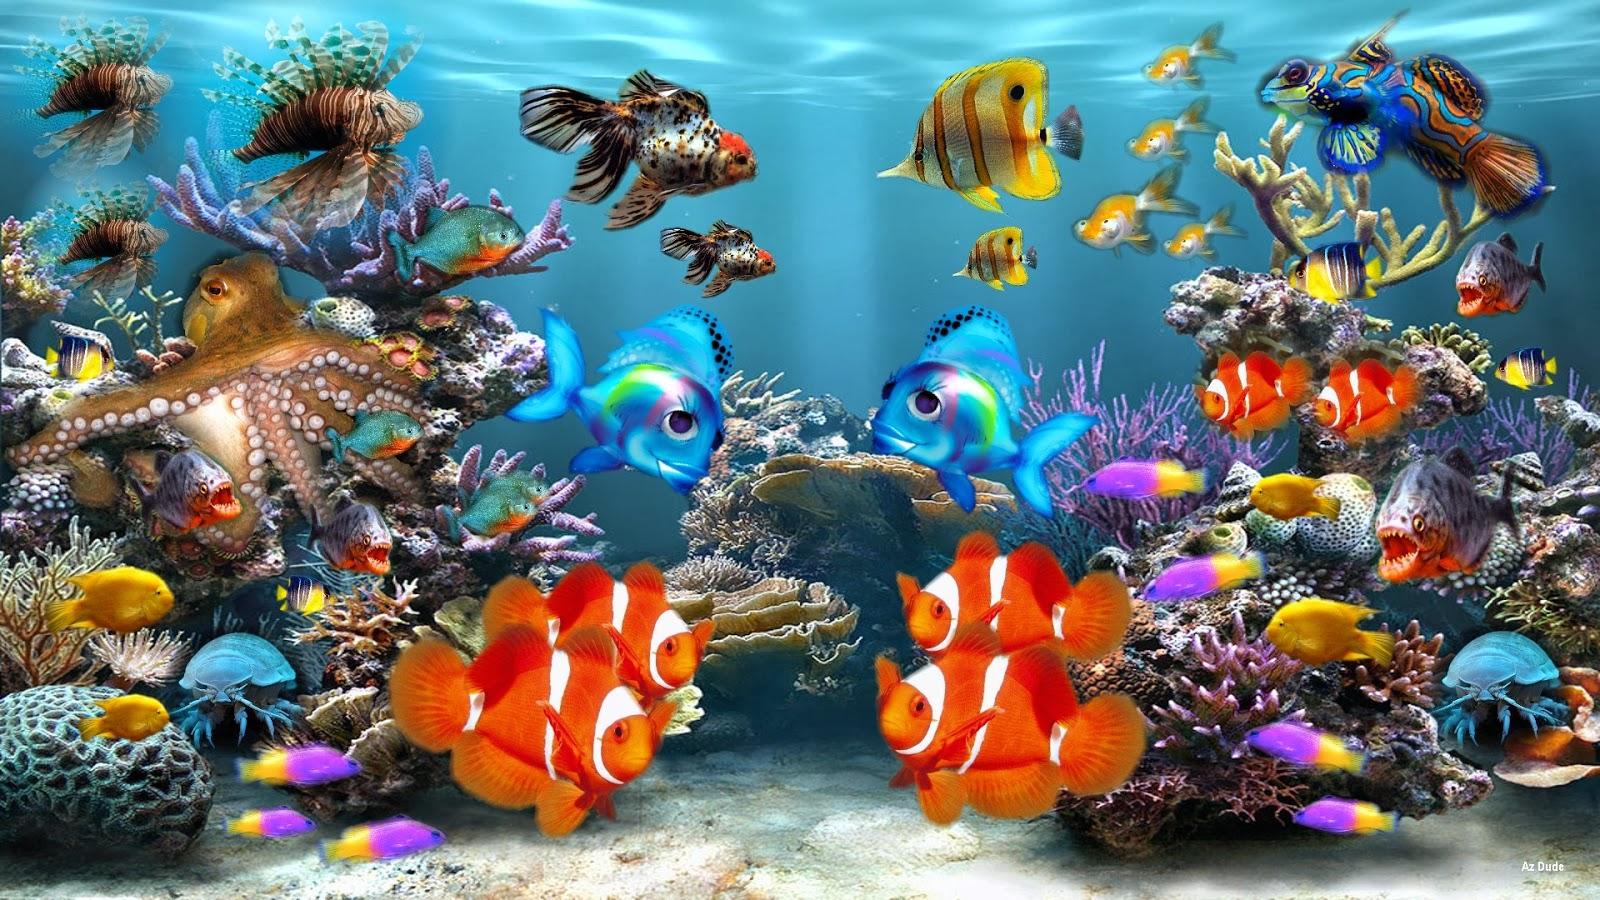 Aquarium HD Wallpapers - Wallpaper Gallery